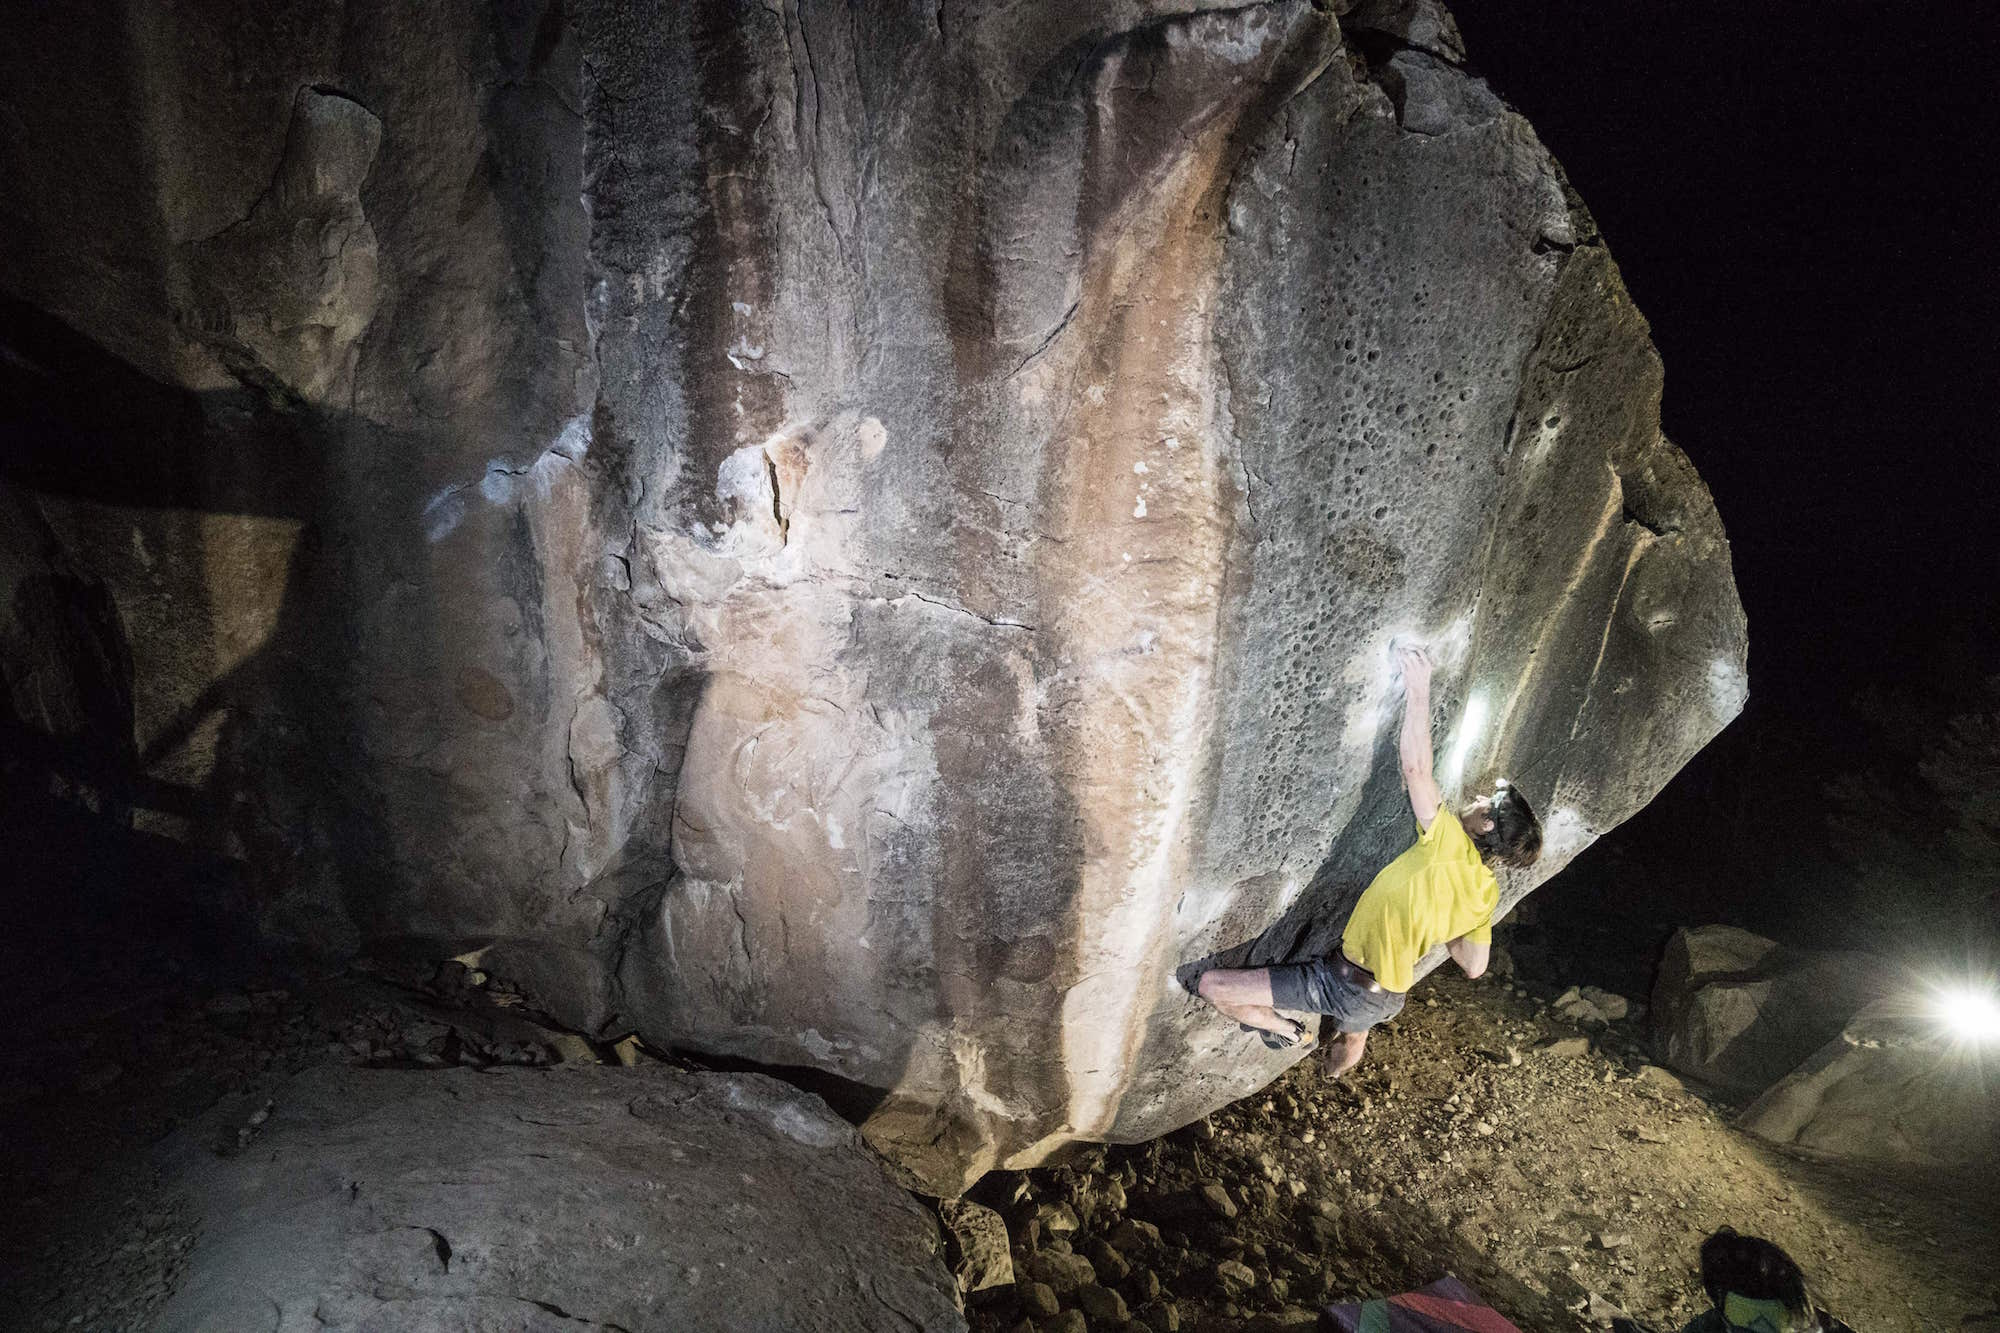 FrictionLabs Athlete Same Weir bouldering in Joe's Valley